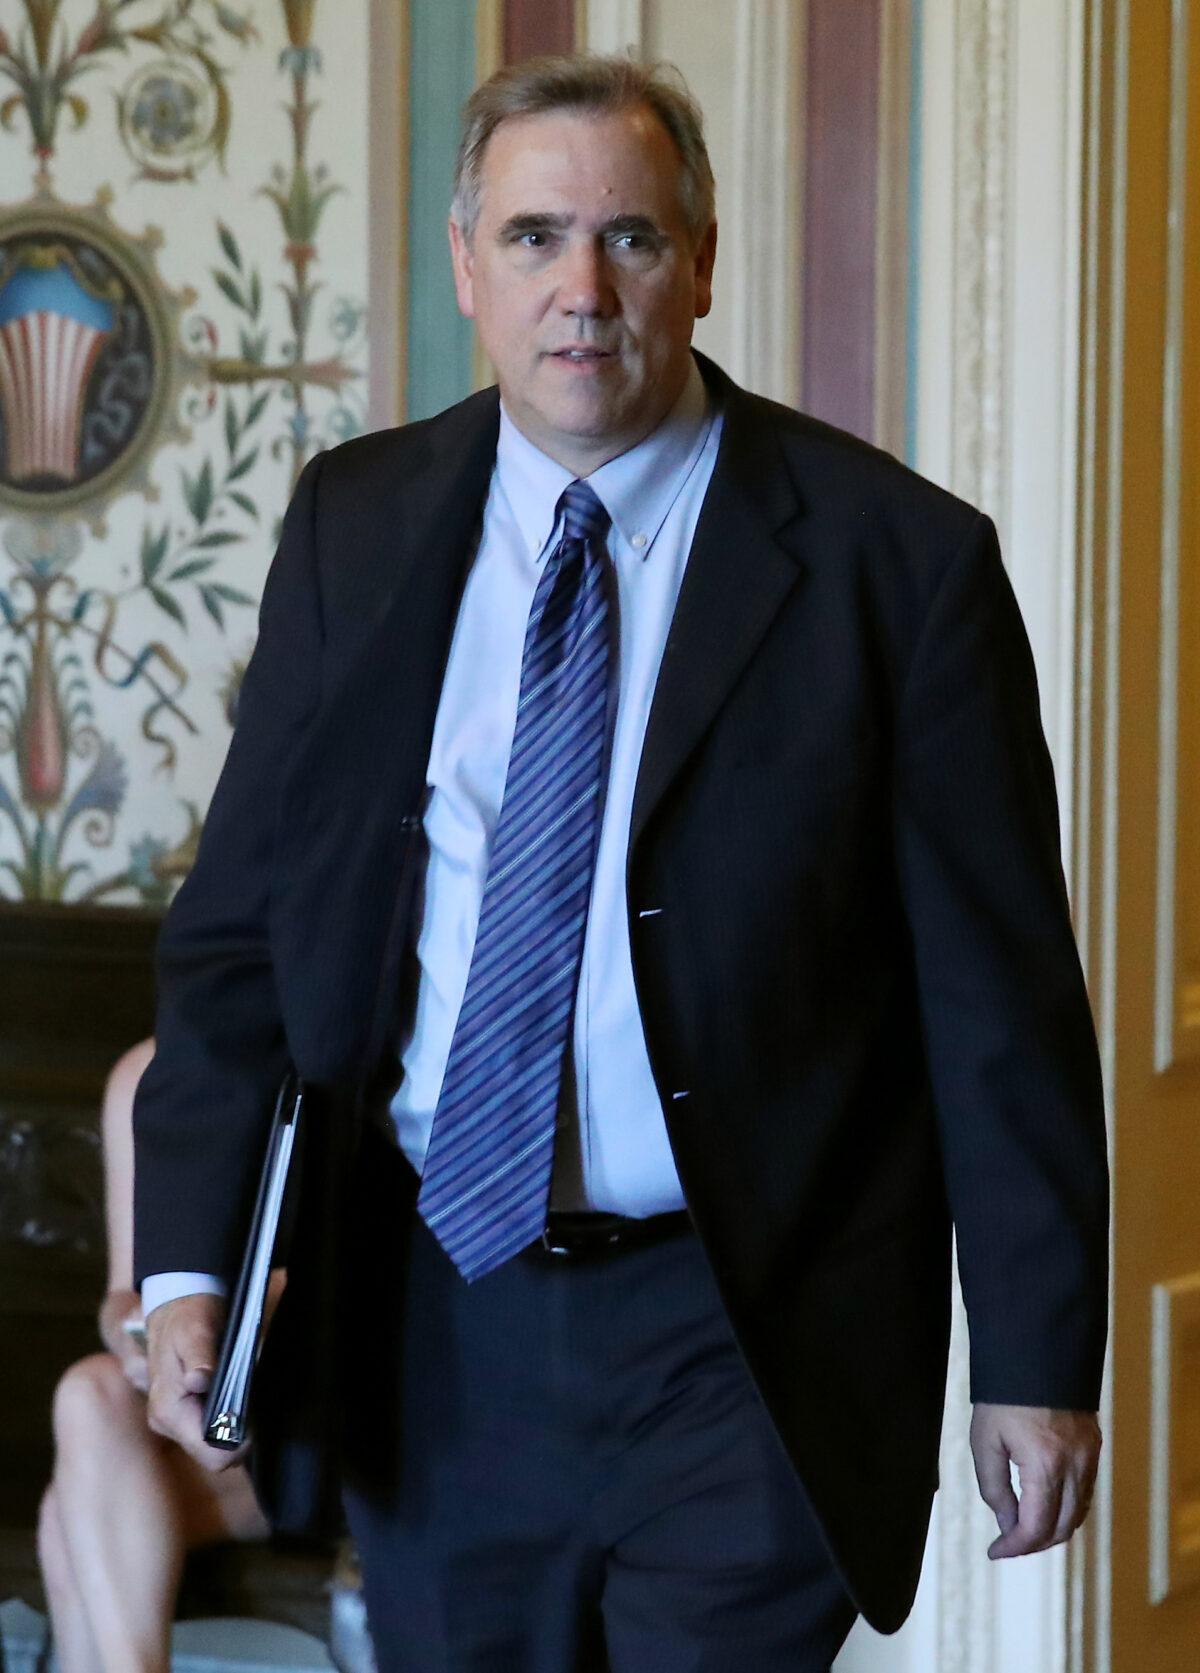 Democratic Sen. Jeff Merkley of Oregon at the Capitol on Aug. 1, 2019. (Mark Wilson/Getty Images)